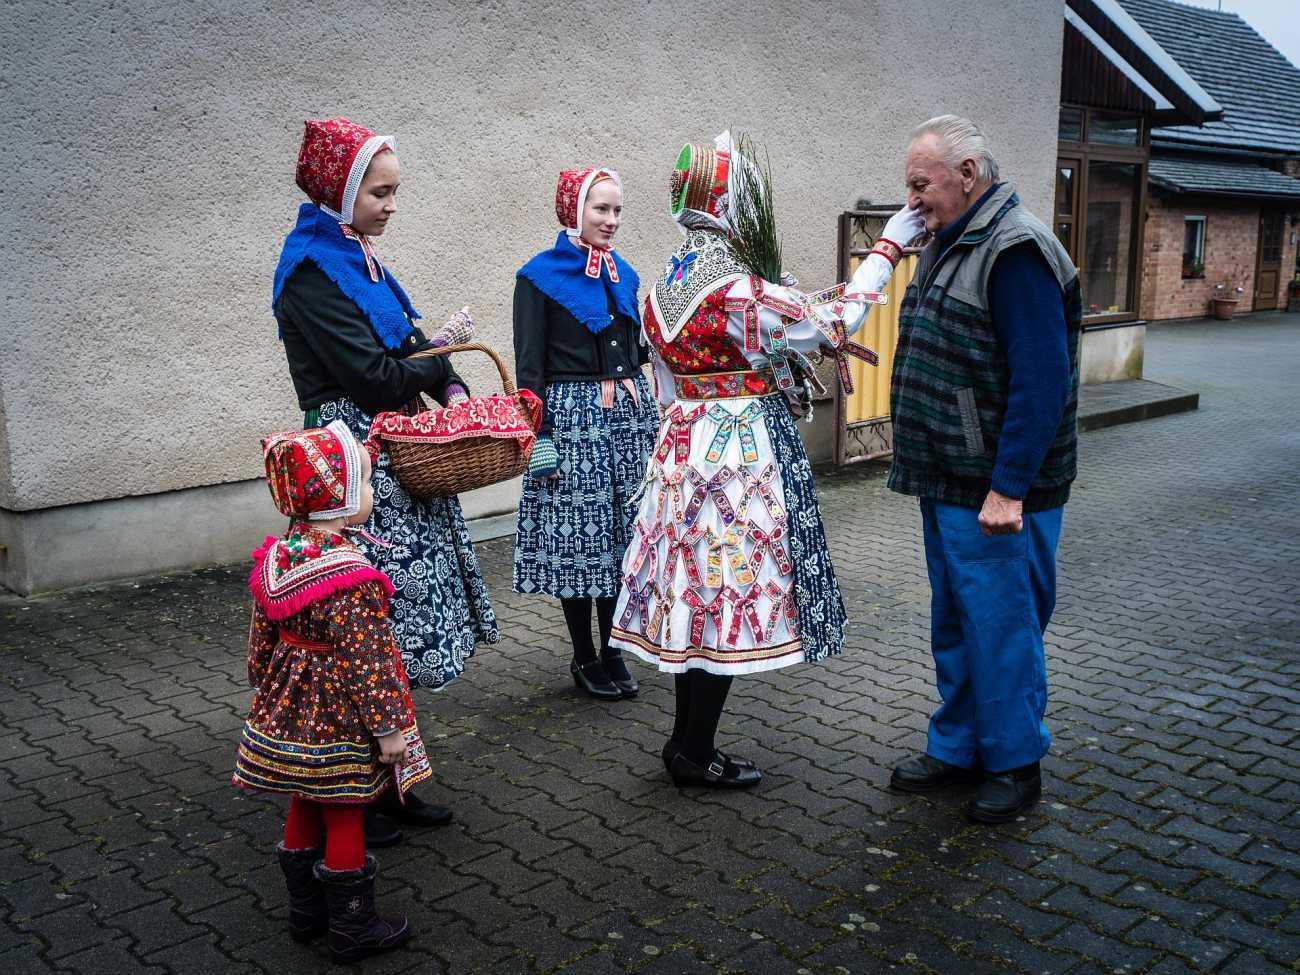 Vom Klein Trebendorfer Christkind gesegnet - 22. Dezember 2017